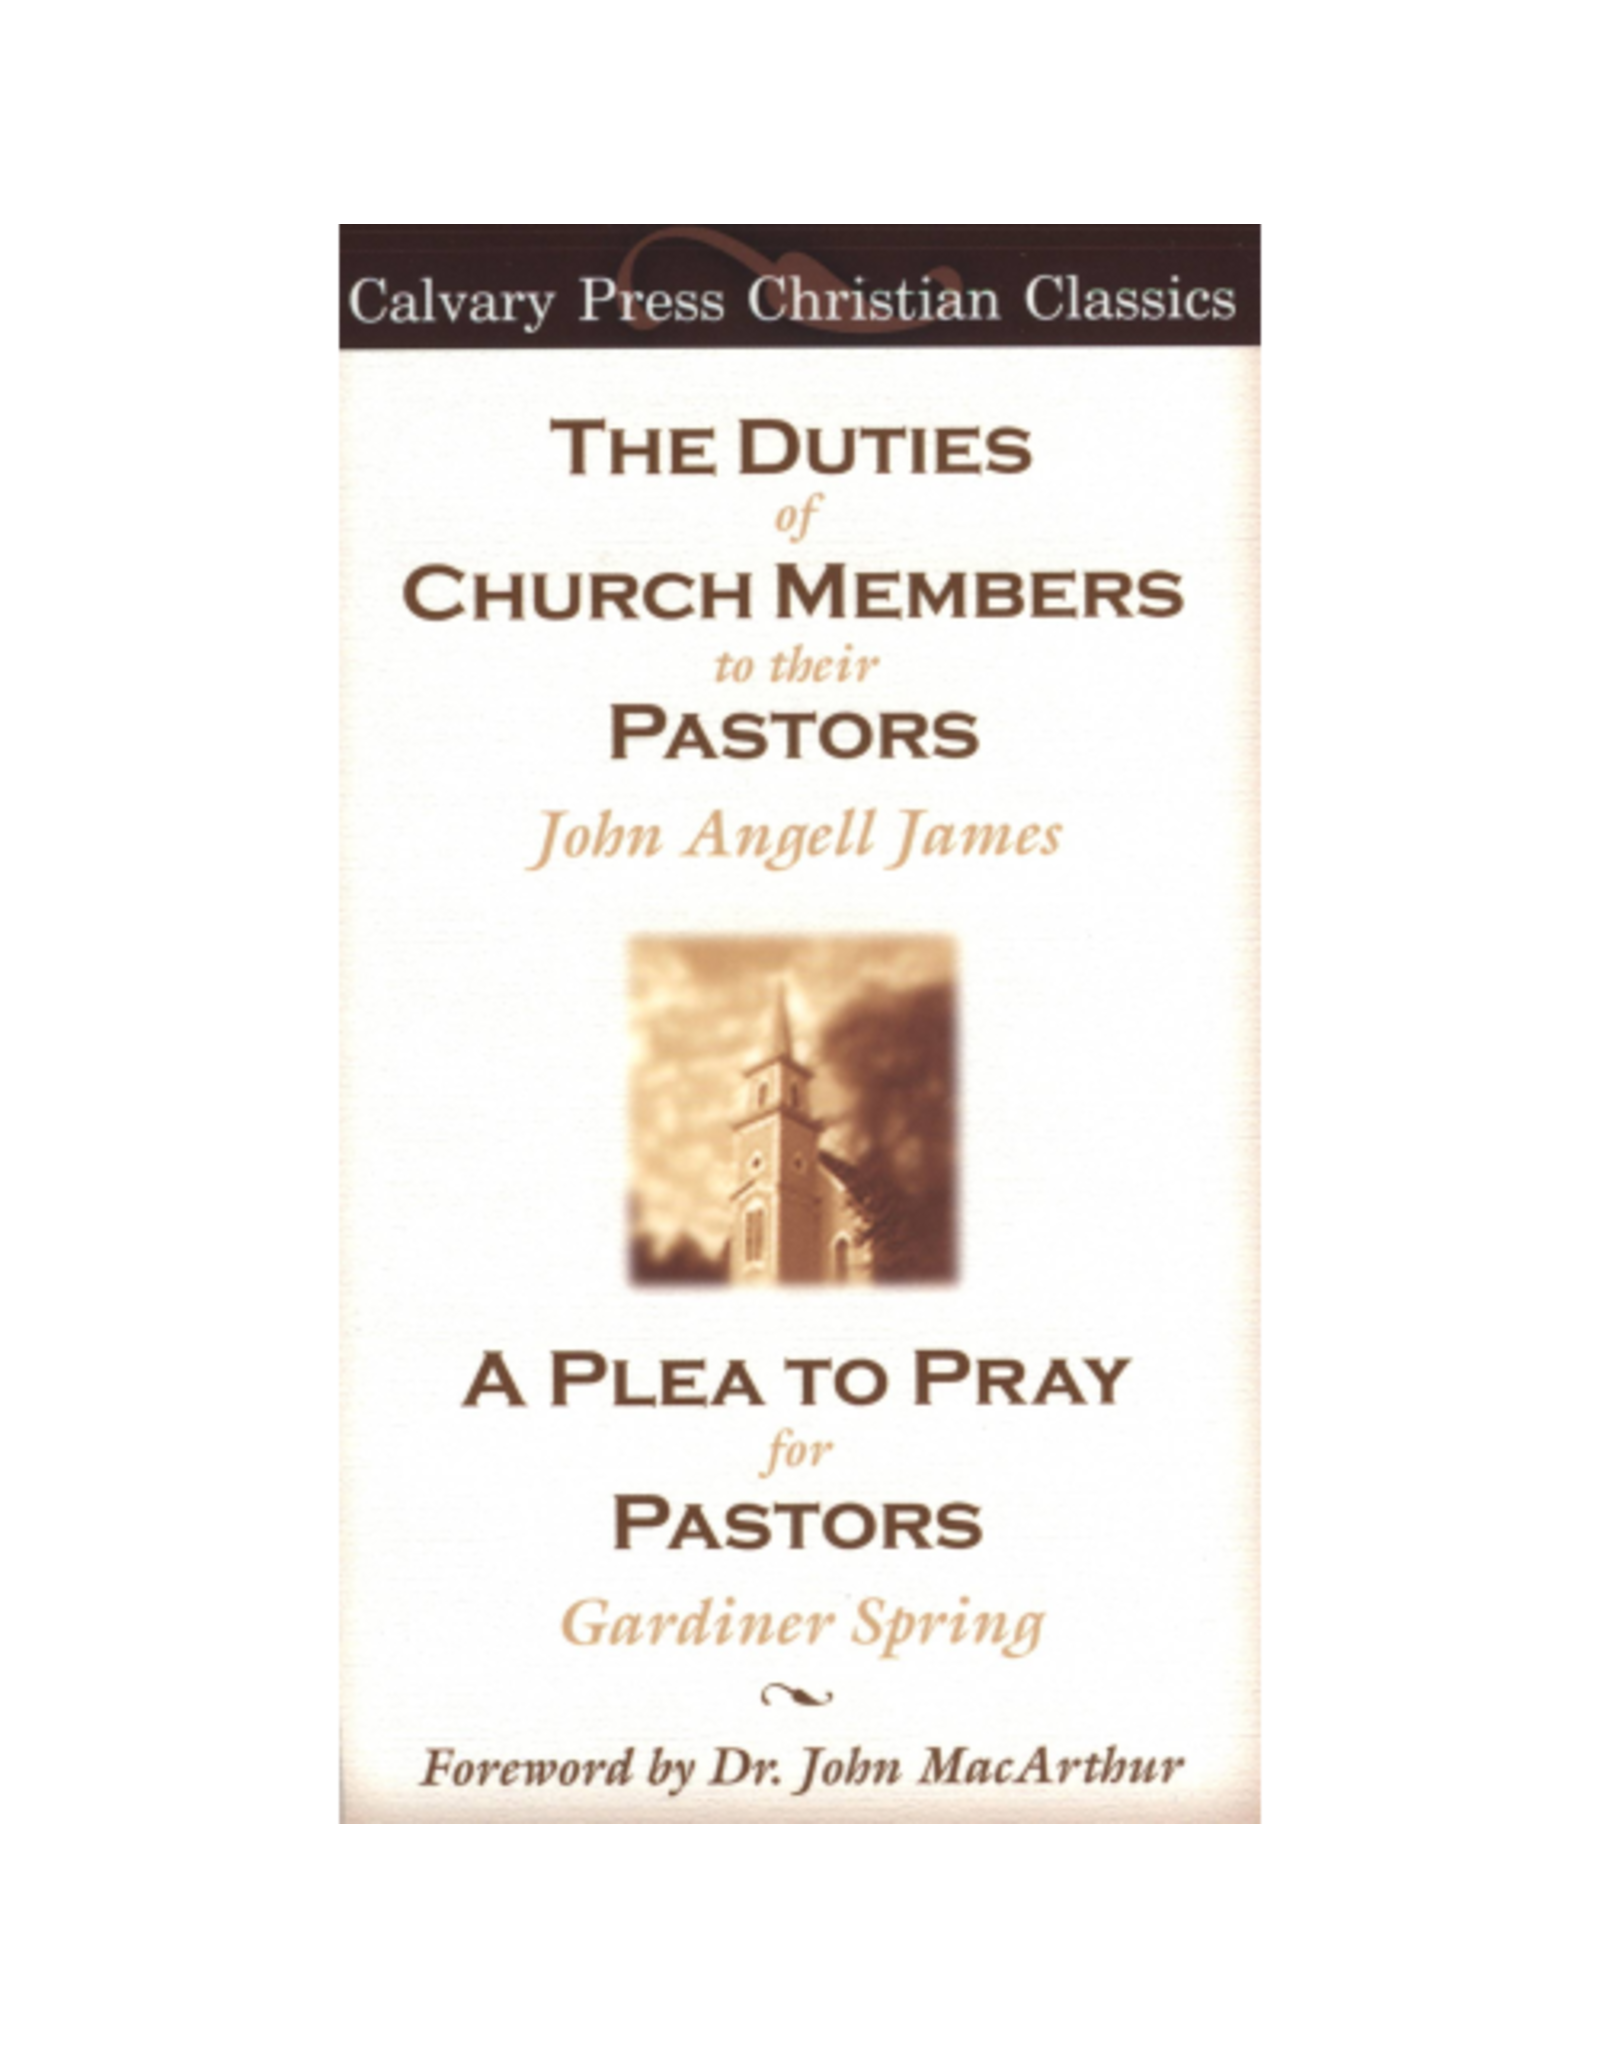 James The Duties of Church Members to their Pastors